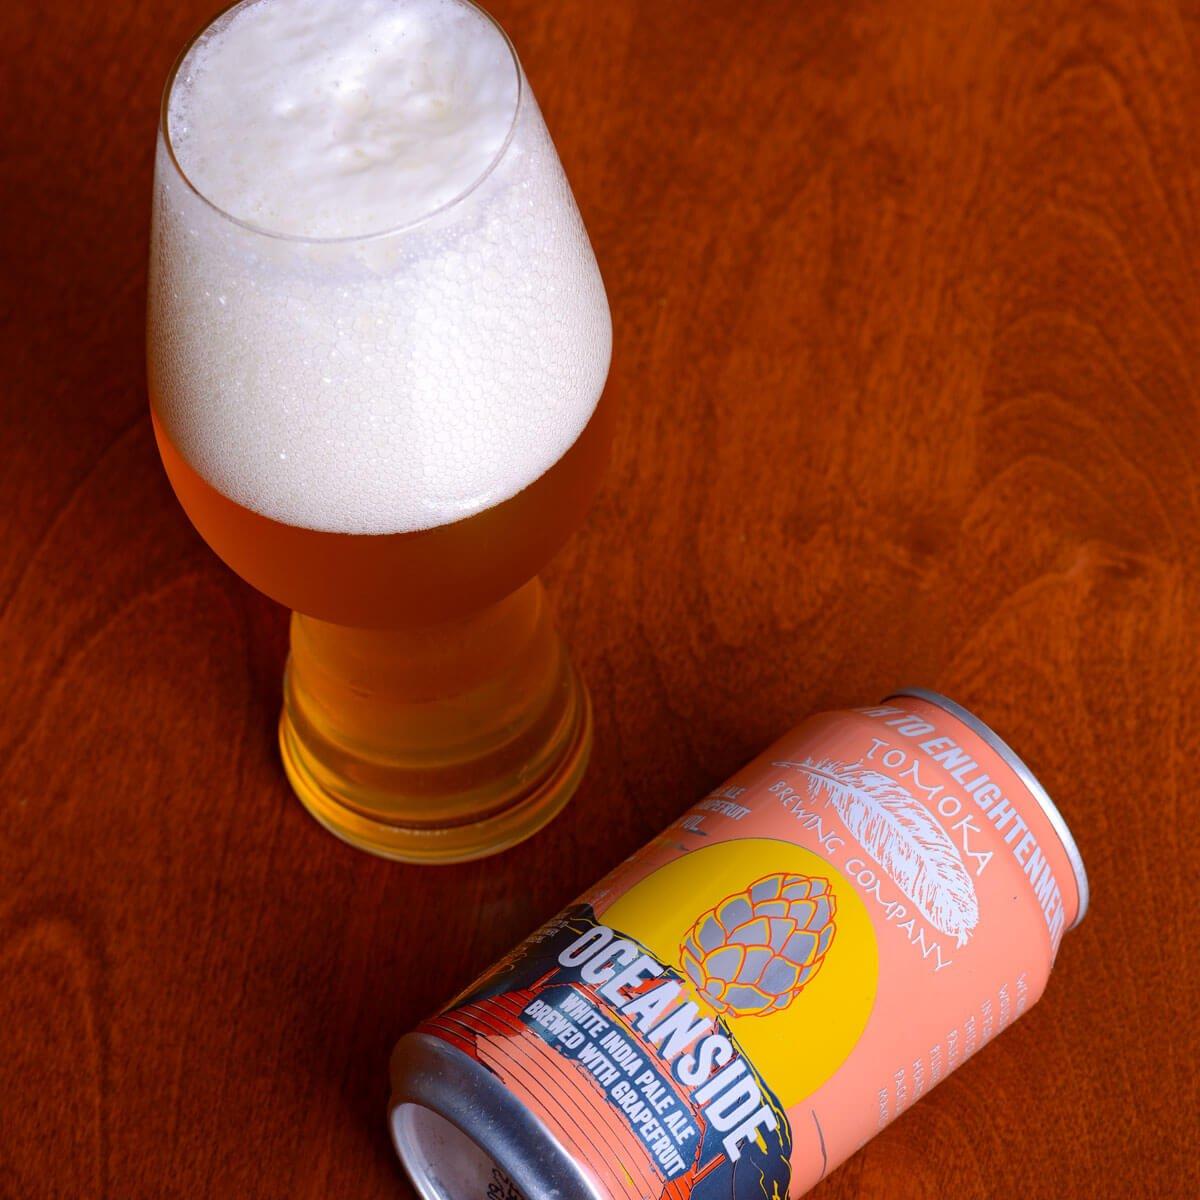 Oceanside White IPA, an American IPA by Tomoka Brewing Company